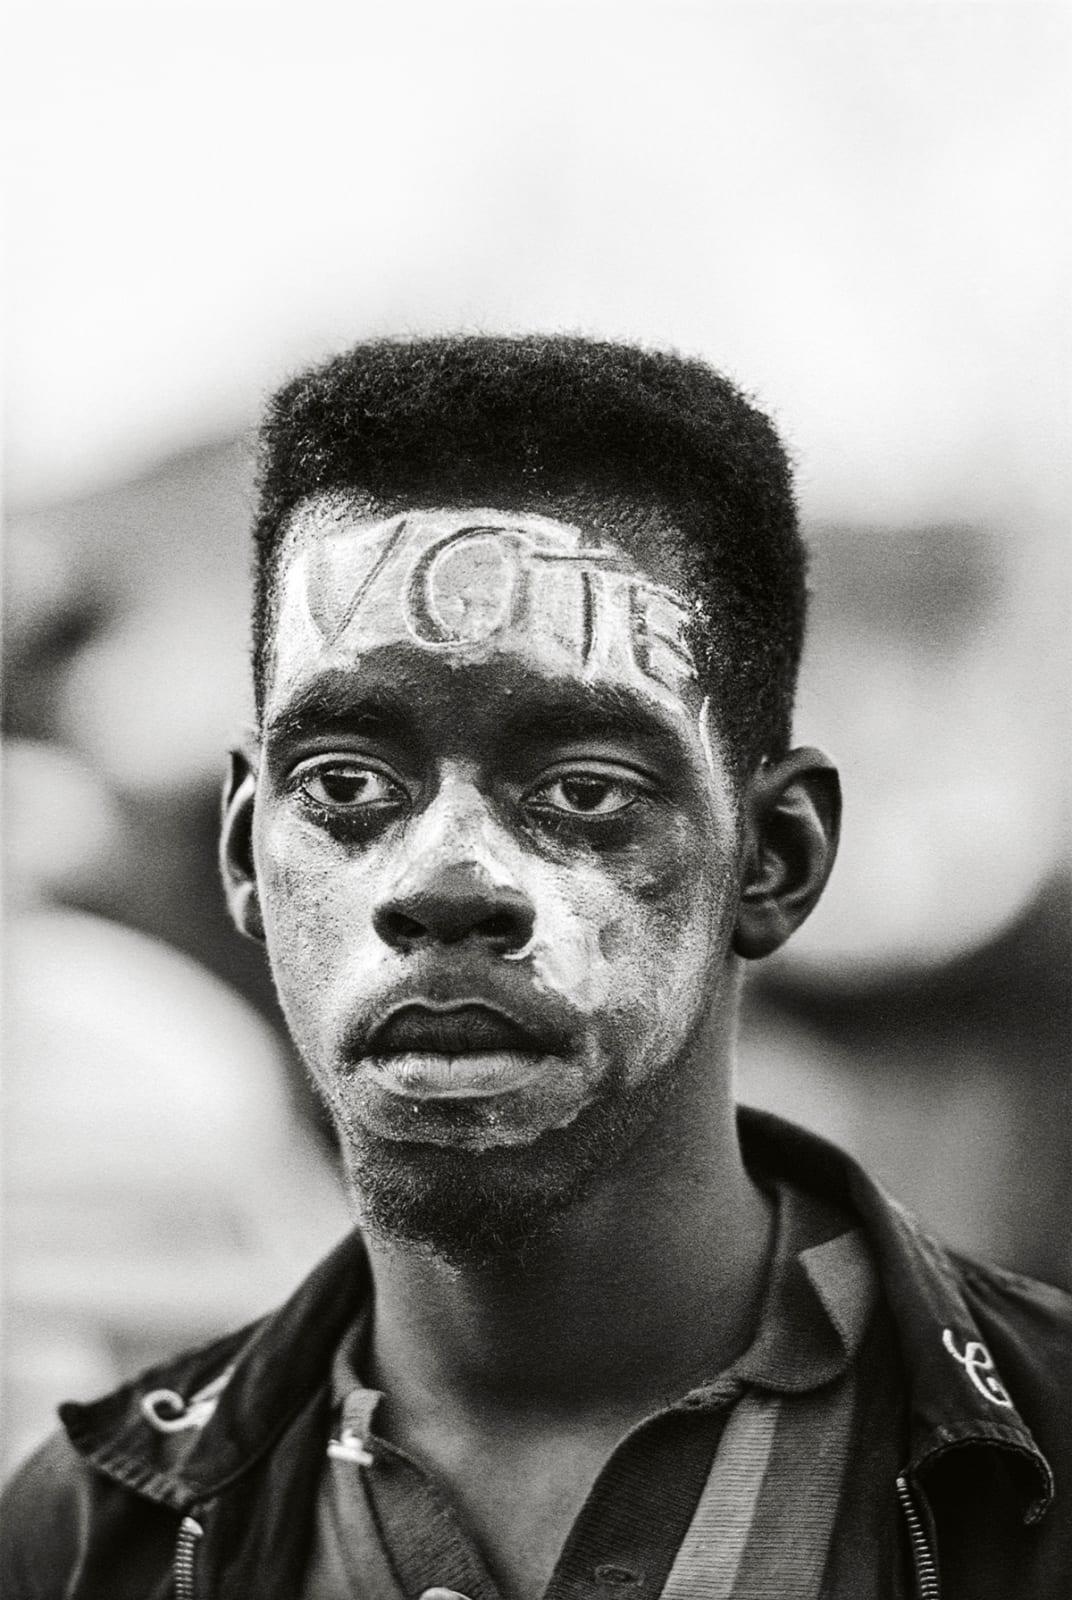 Steve Schapiro VOTE, Selma March, 1965